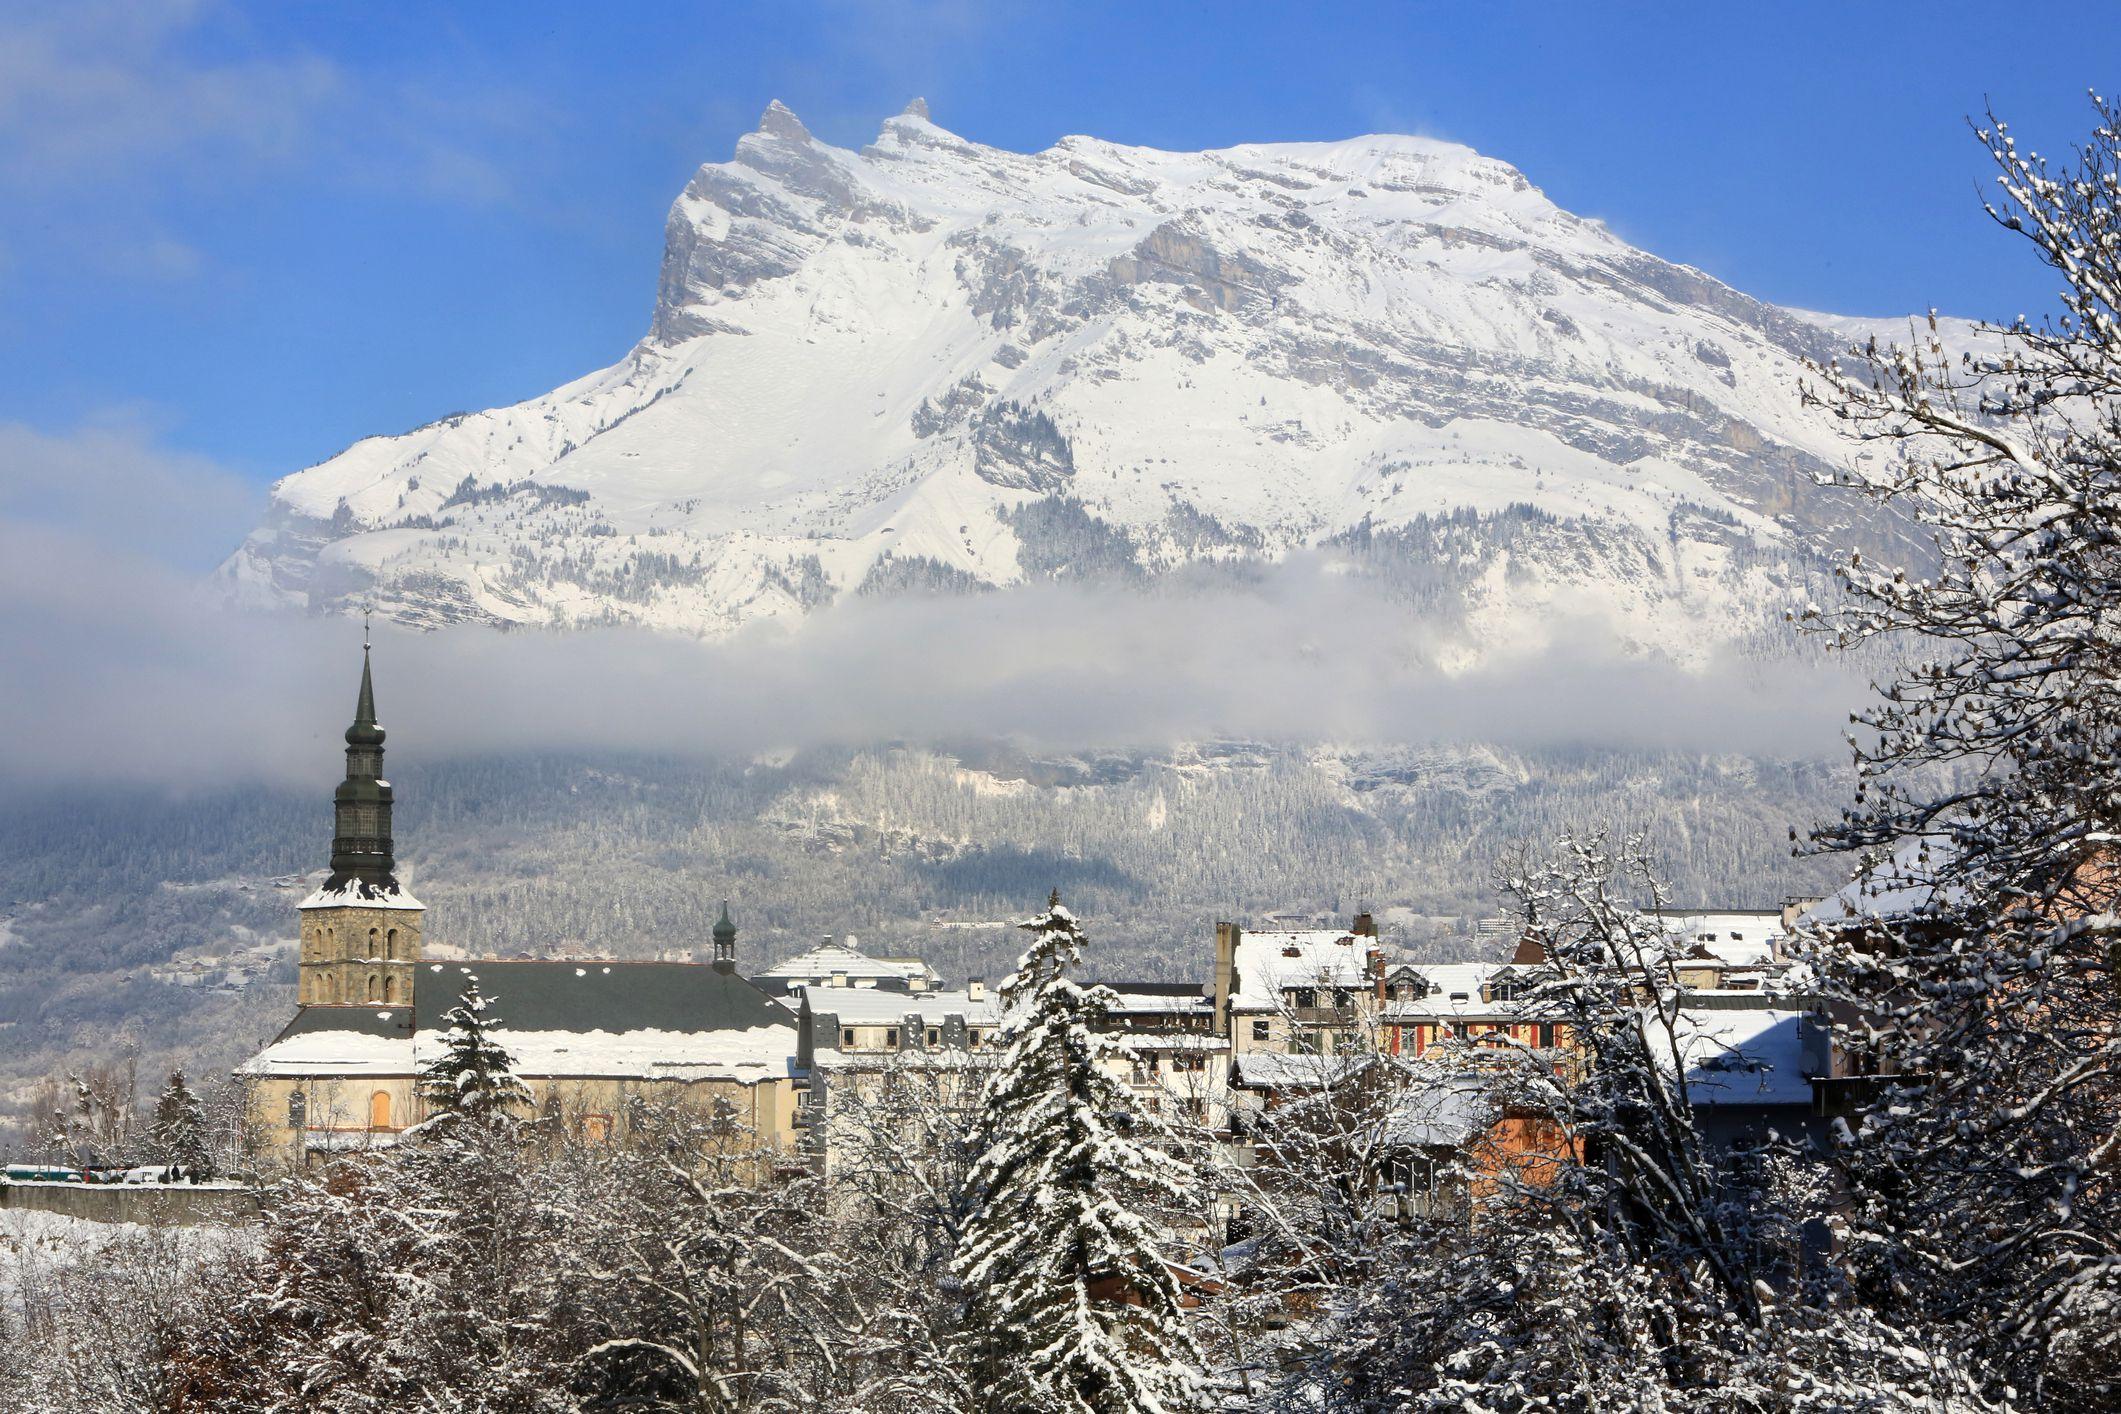 10 Paris Stopover Rail Journeys to the French Alps